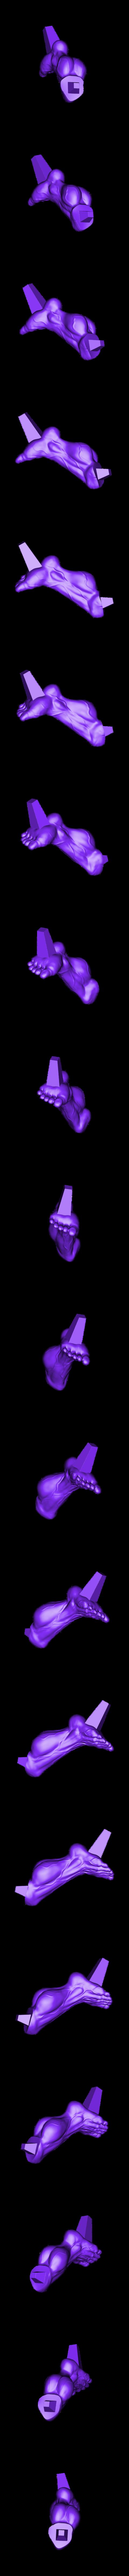 Lleg_225mm.stl Download STL file Hulk Angry - Super Hero - Marvel 3D print model • 3D print model, Bstar3Dart